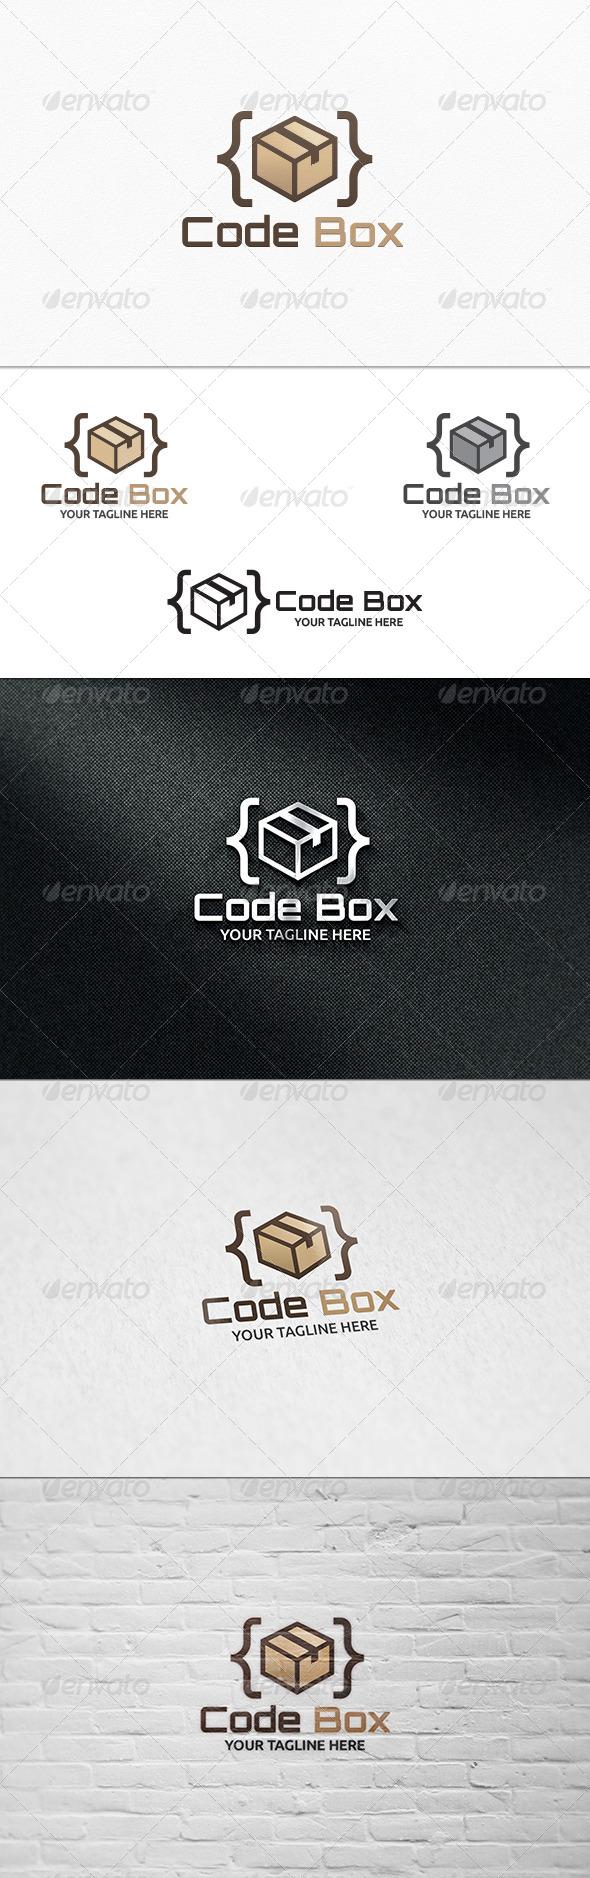 Code Box Logo Template